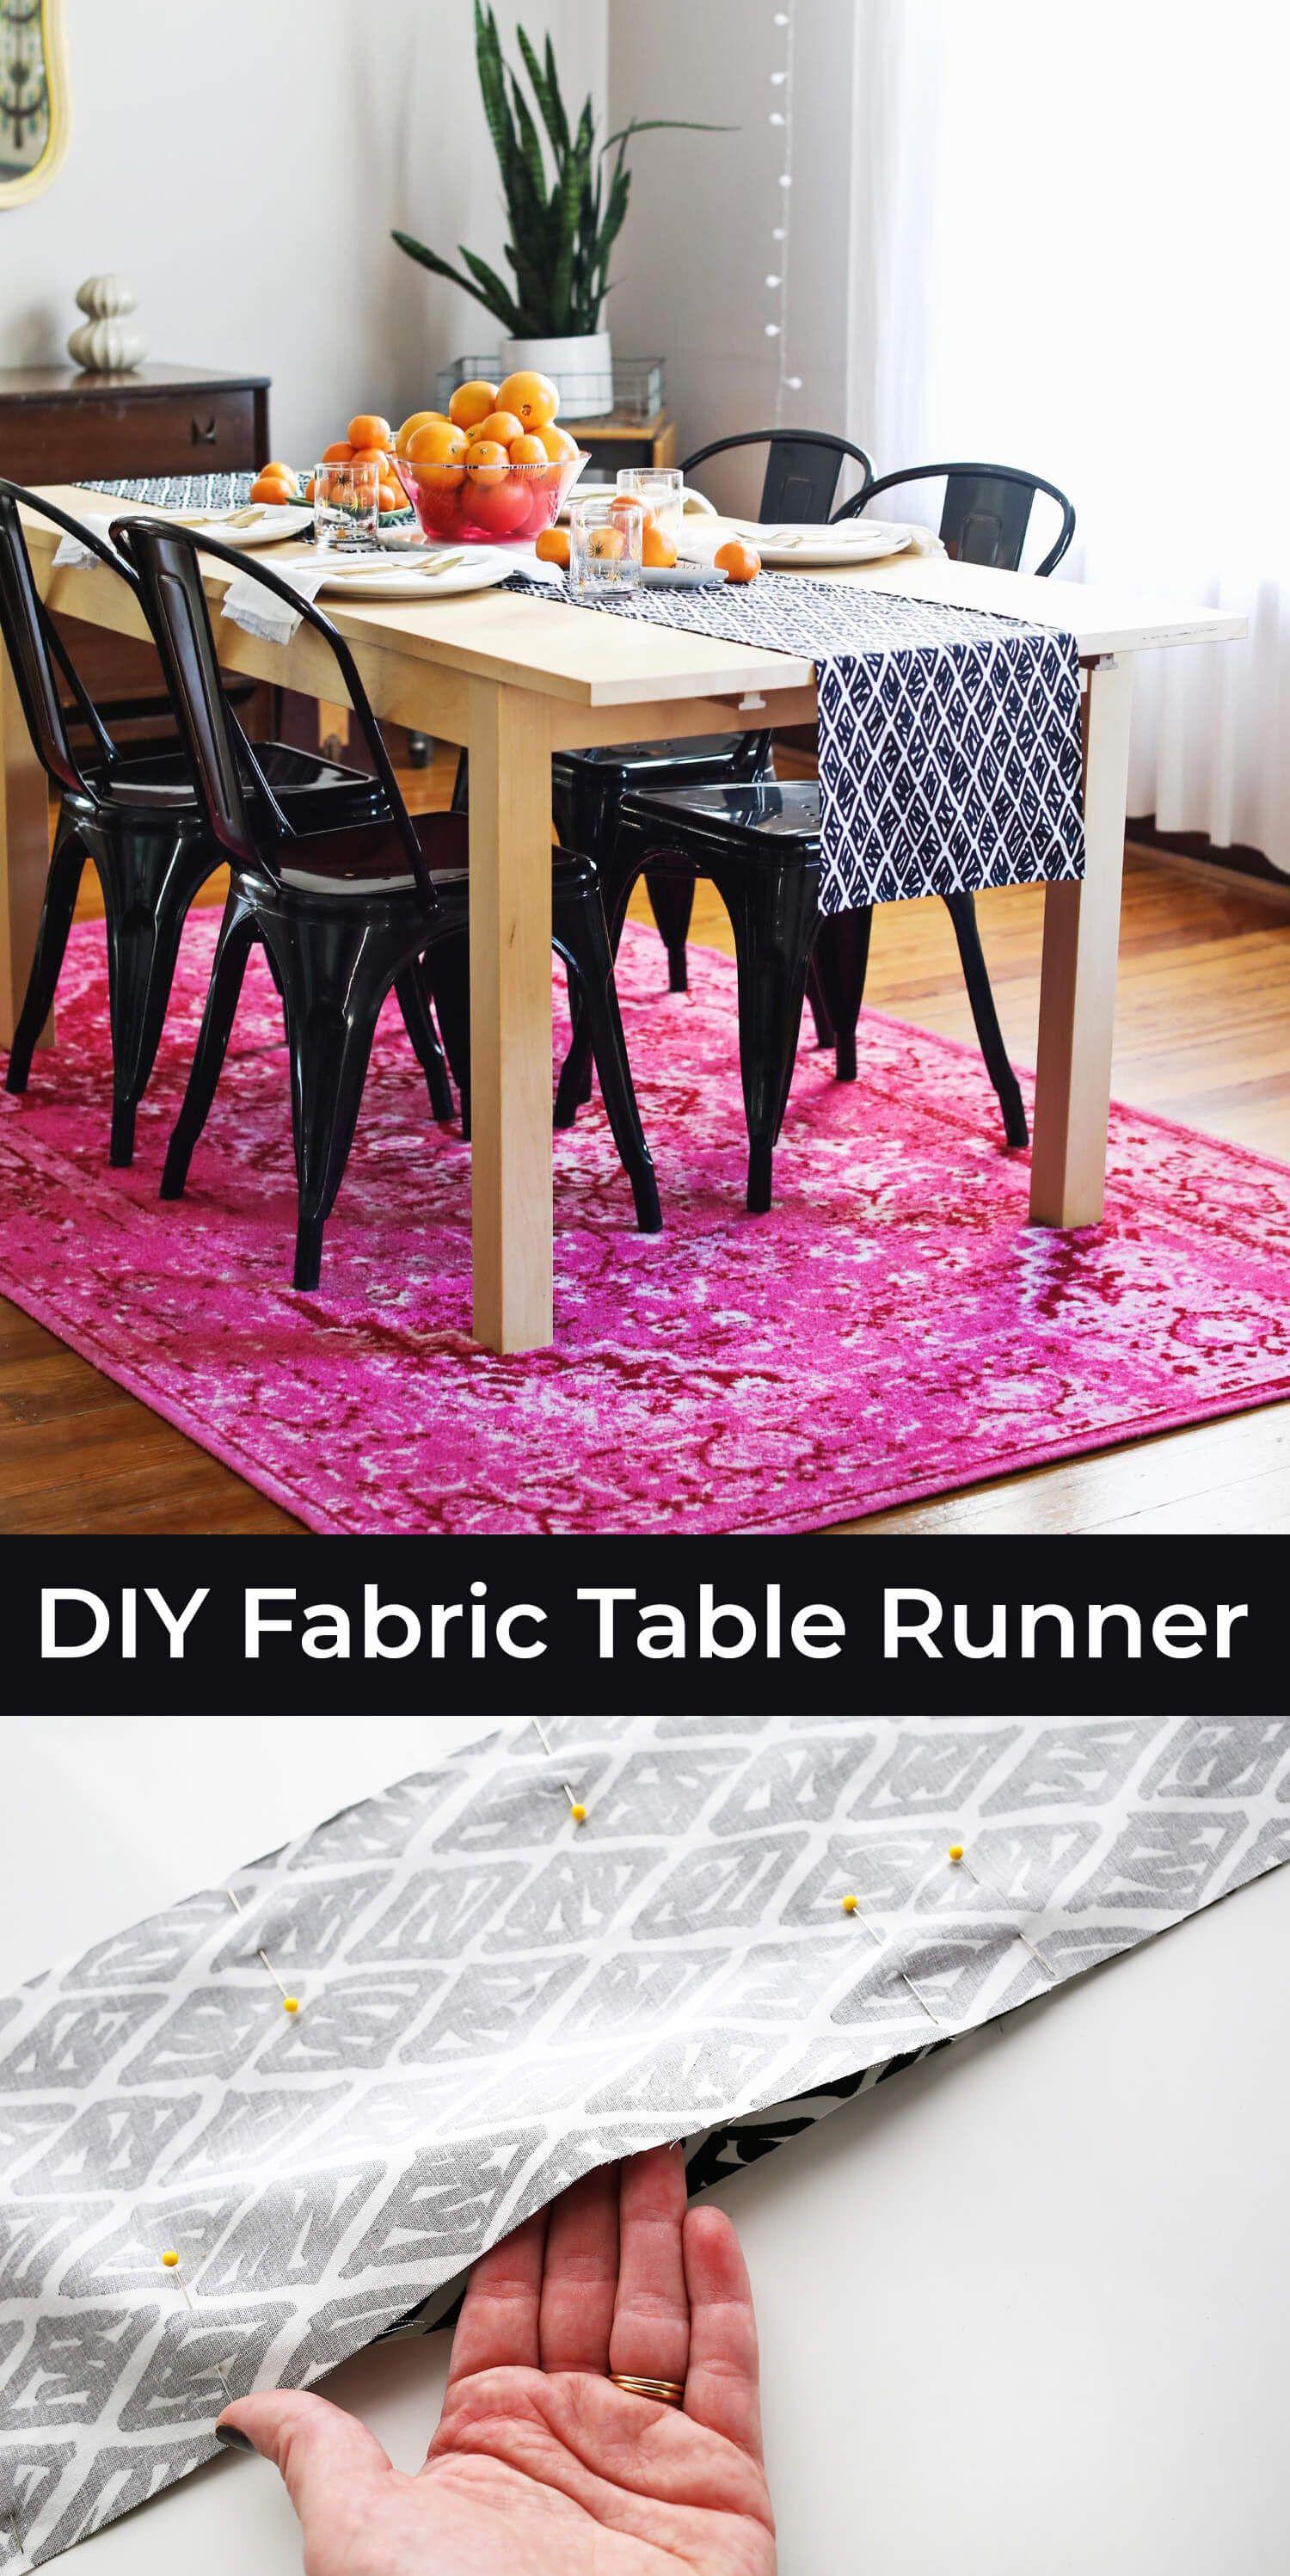 Groovy Diy Modern Table Runner Craft Night Pinterest Modern Download Free Architecture Designs Embacsunscenecom